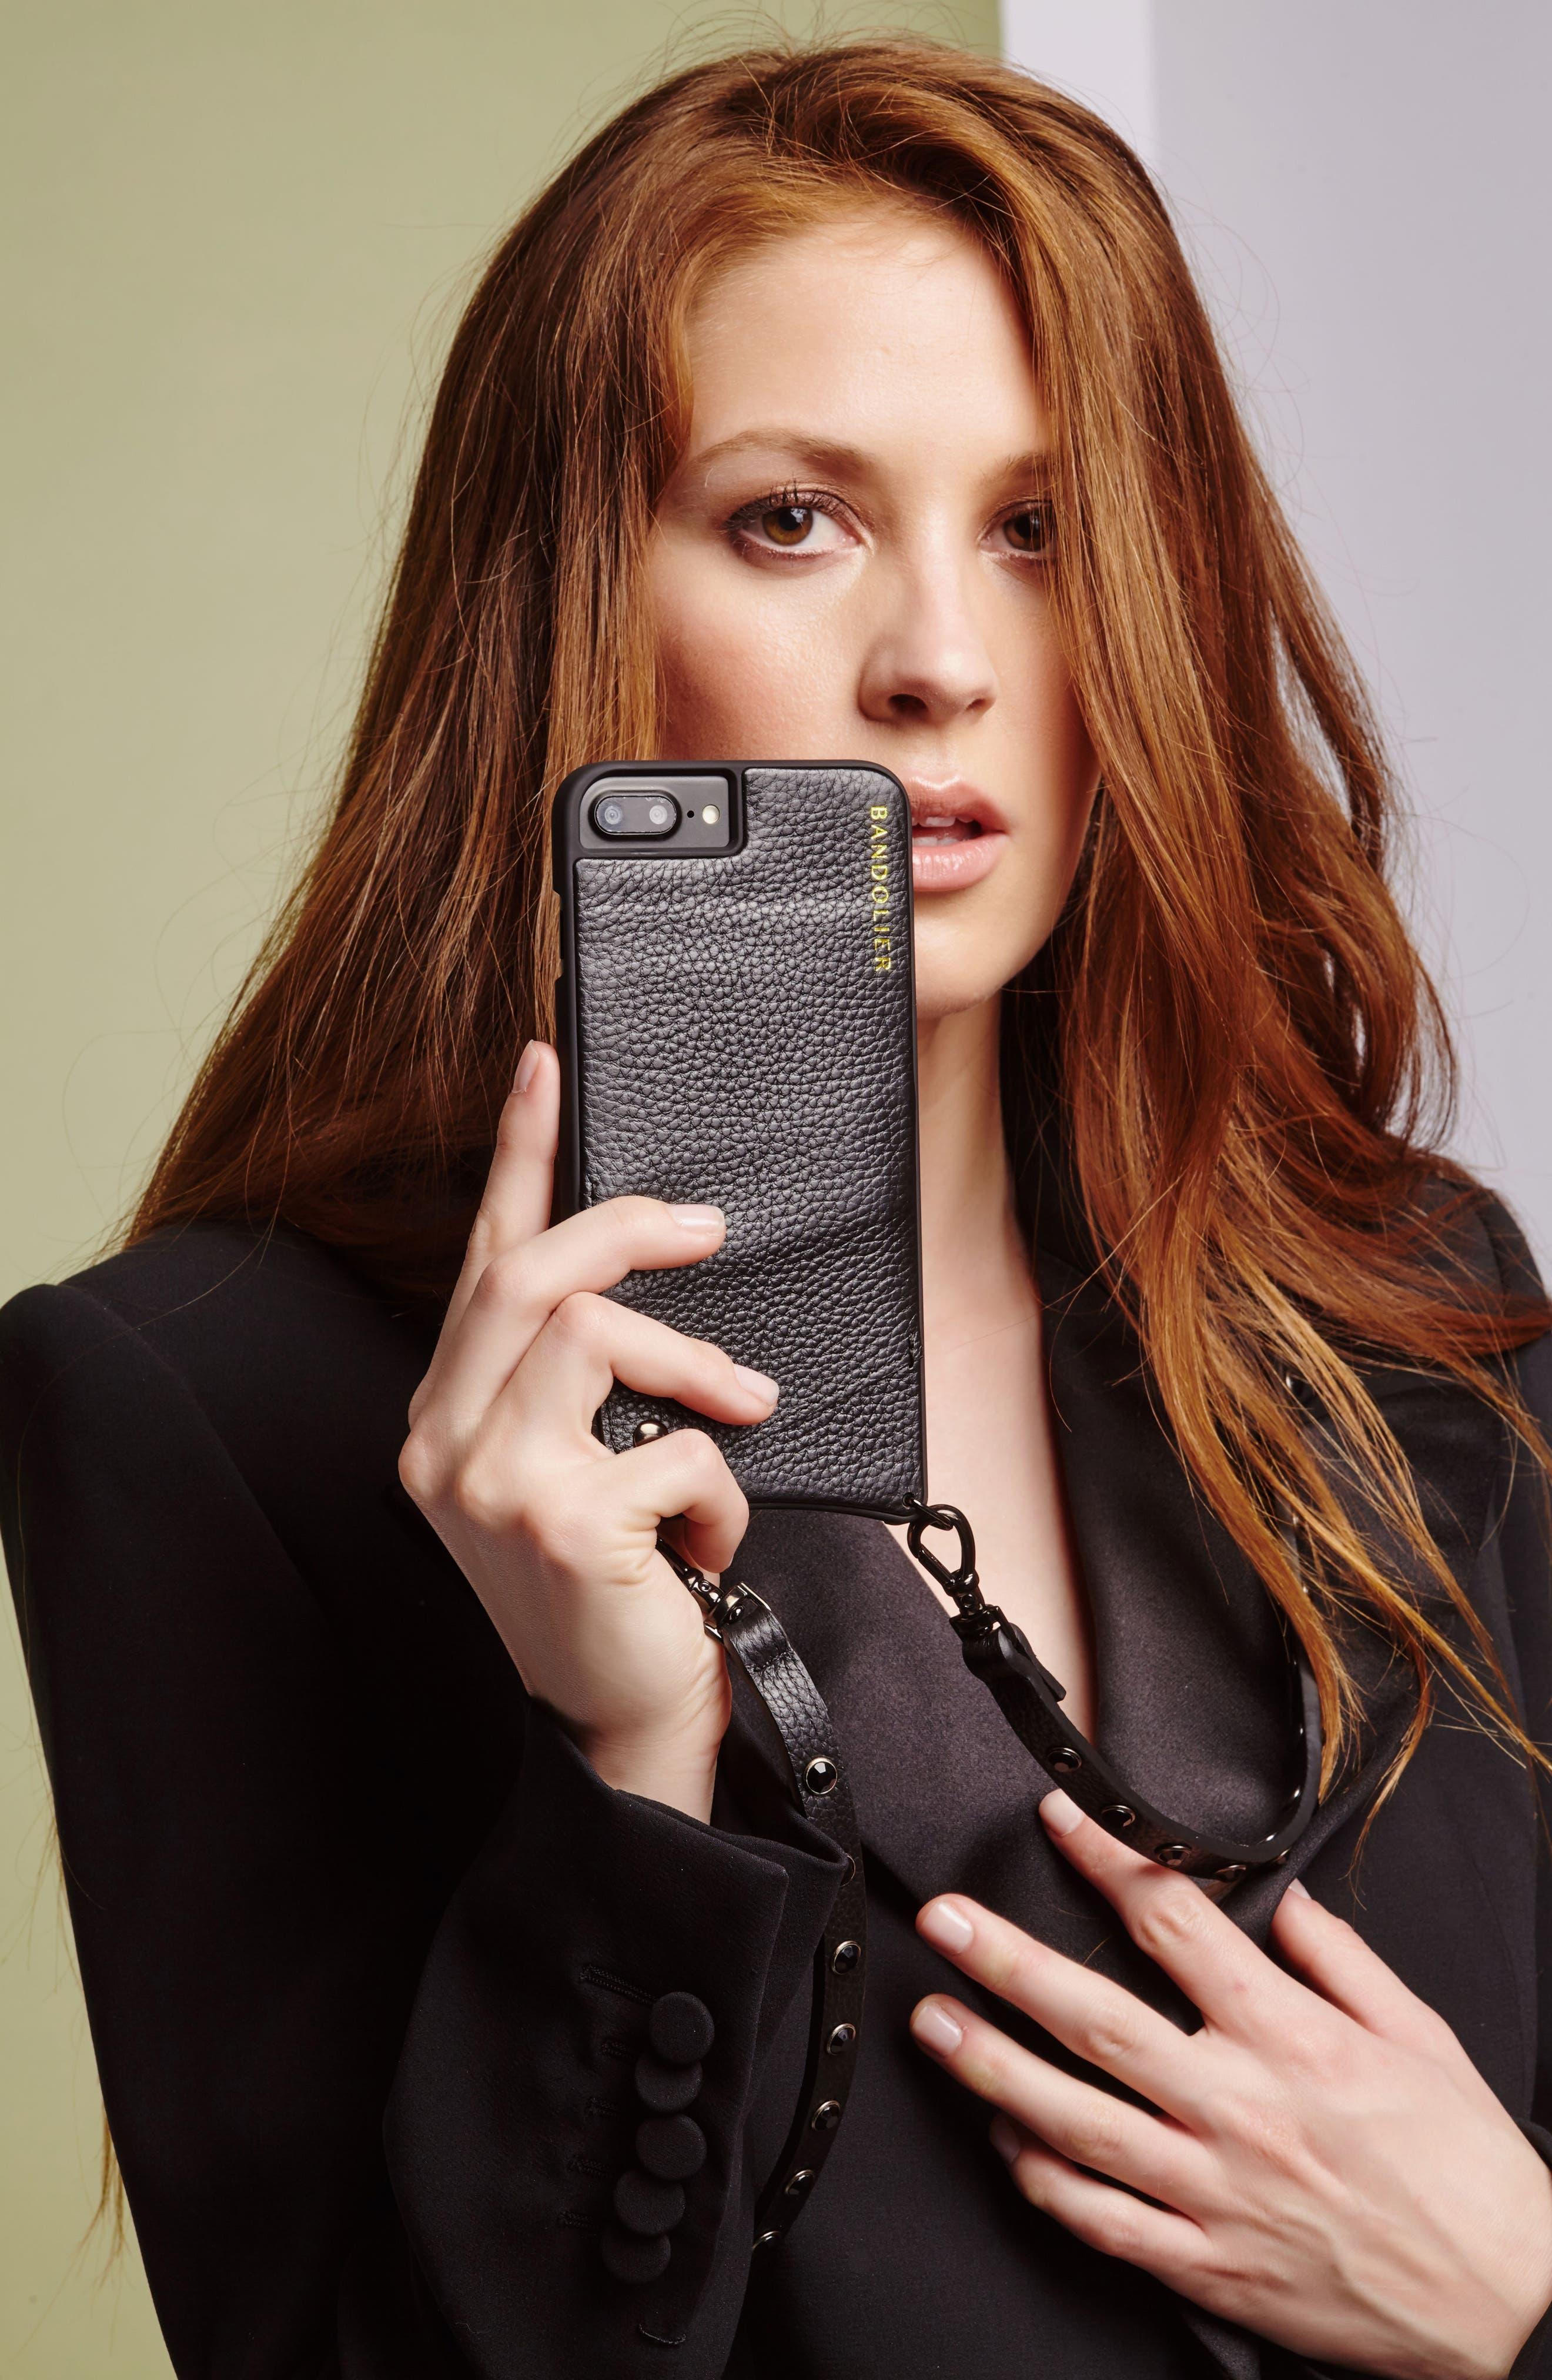 Jules Leather iPhone 6/7/8 & 6/7/8 Plus Crossbody Case,                             Alternate thumbnail 2, color,                             Black/ Pewter